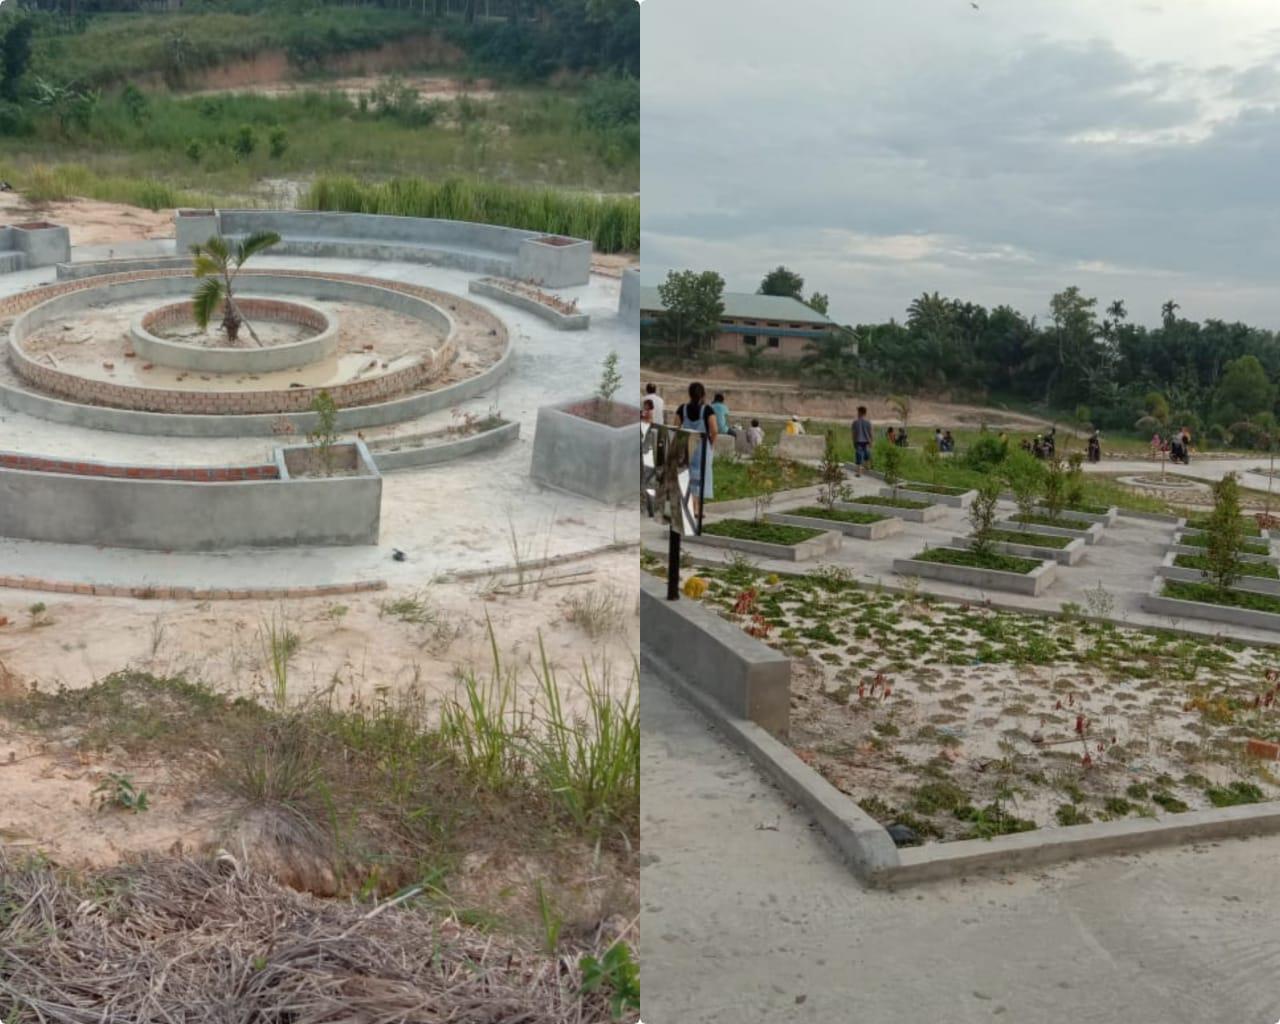 Warga Kecewa, Pembangunan Taman Bermain Anak di Tebingtinggi Dikerjakan Asal Jadi dan Terbengkalai